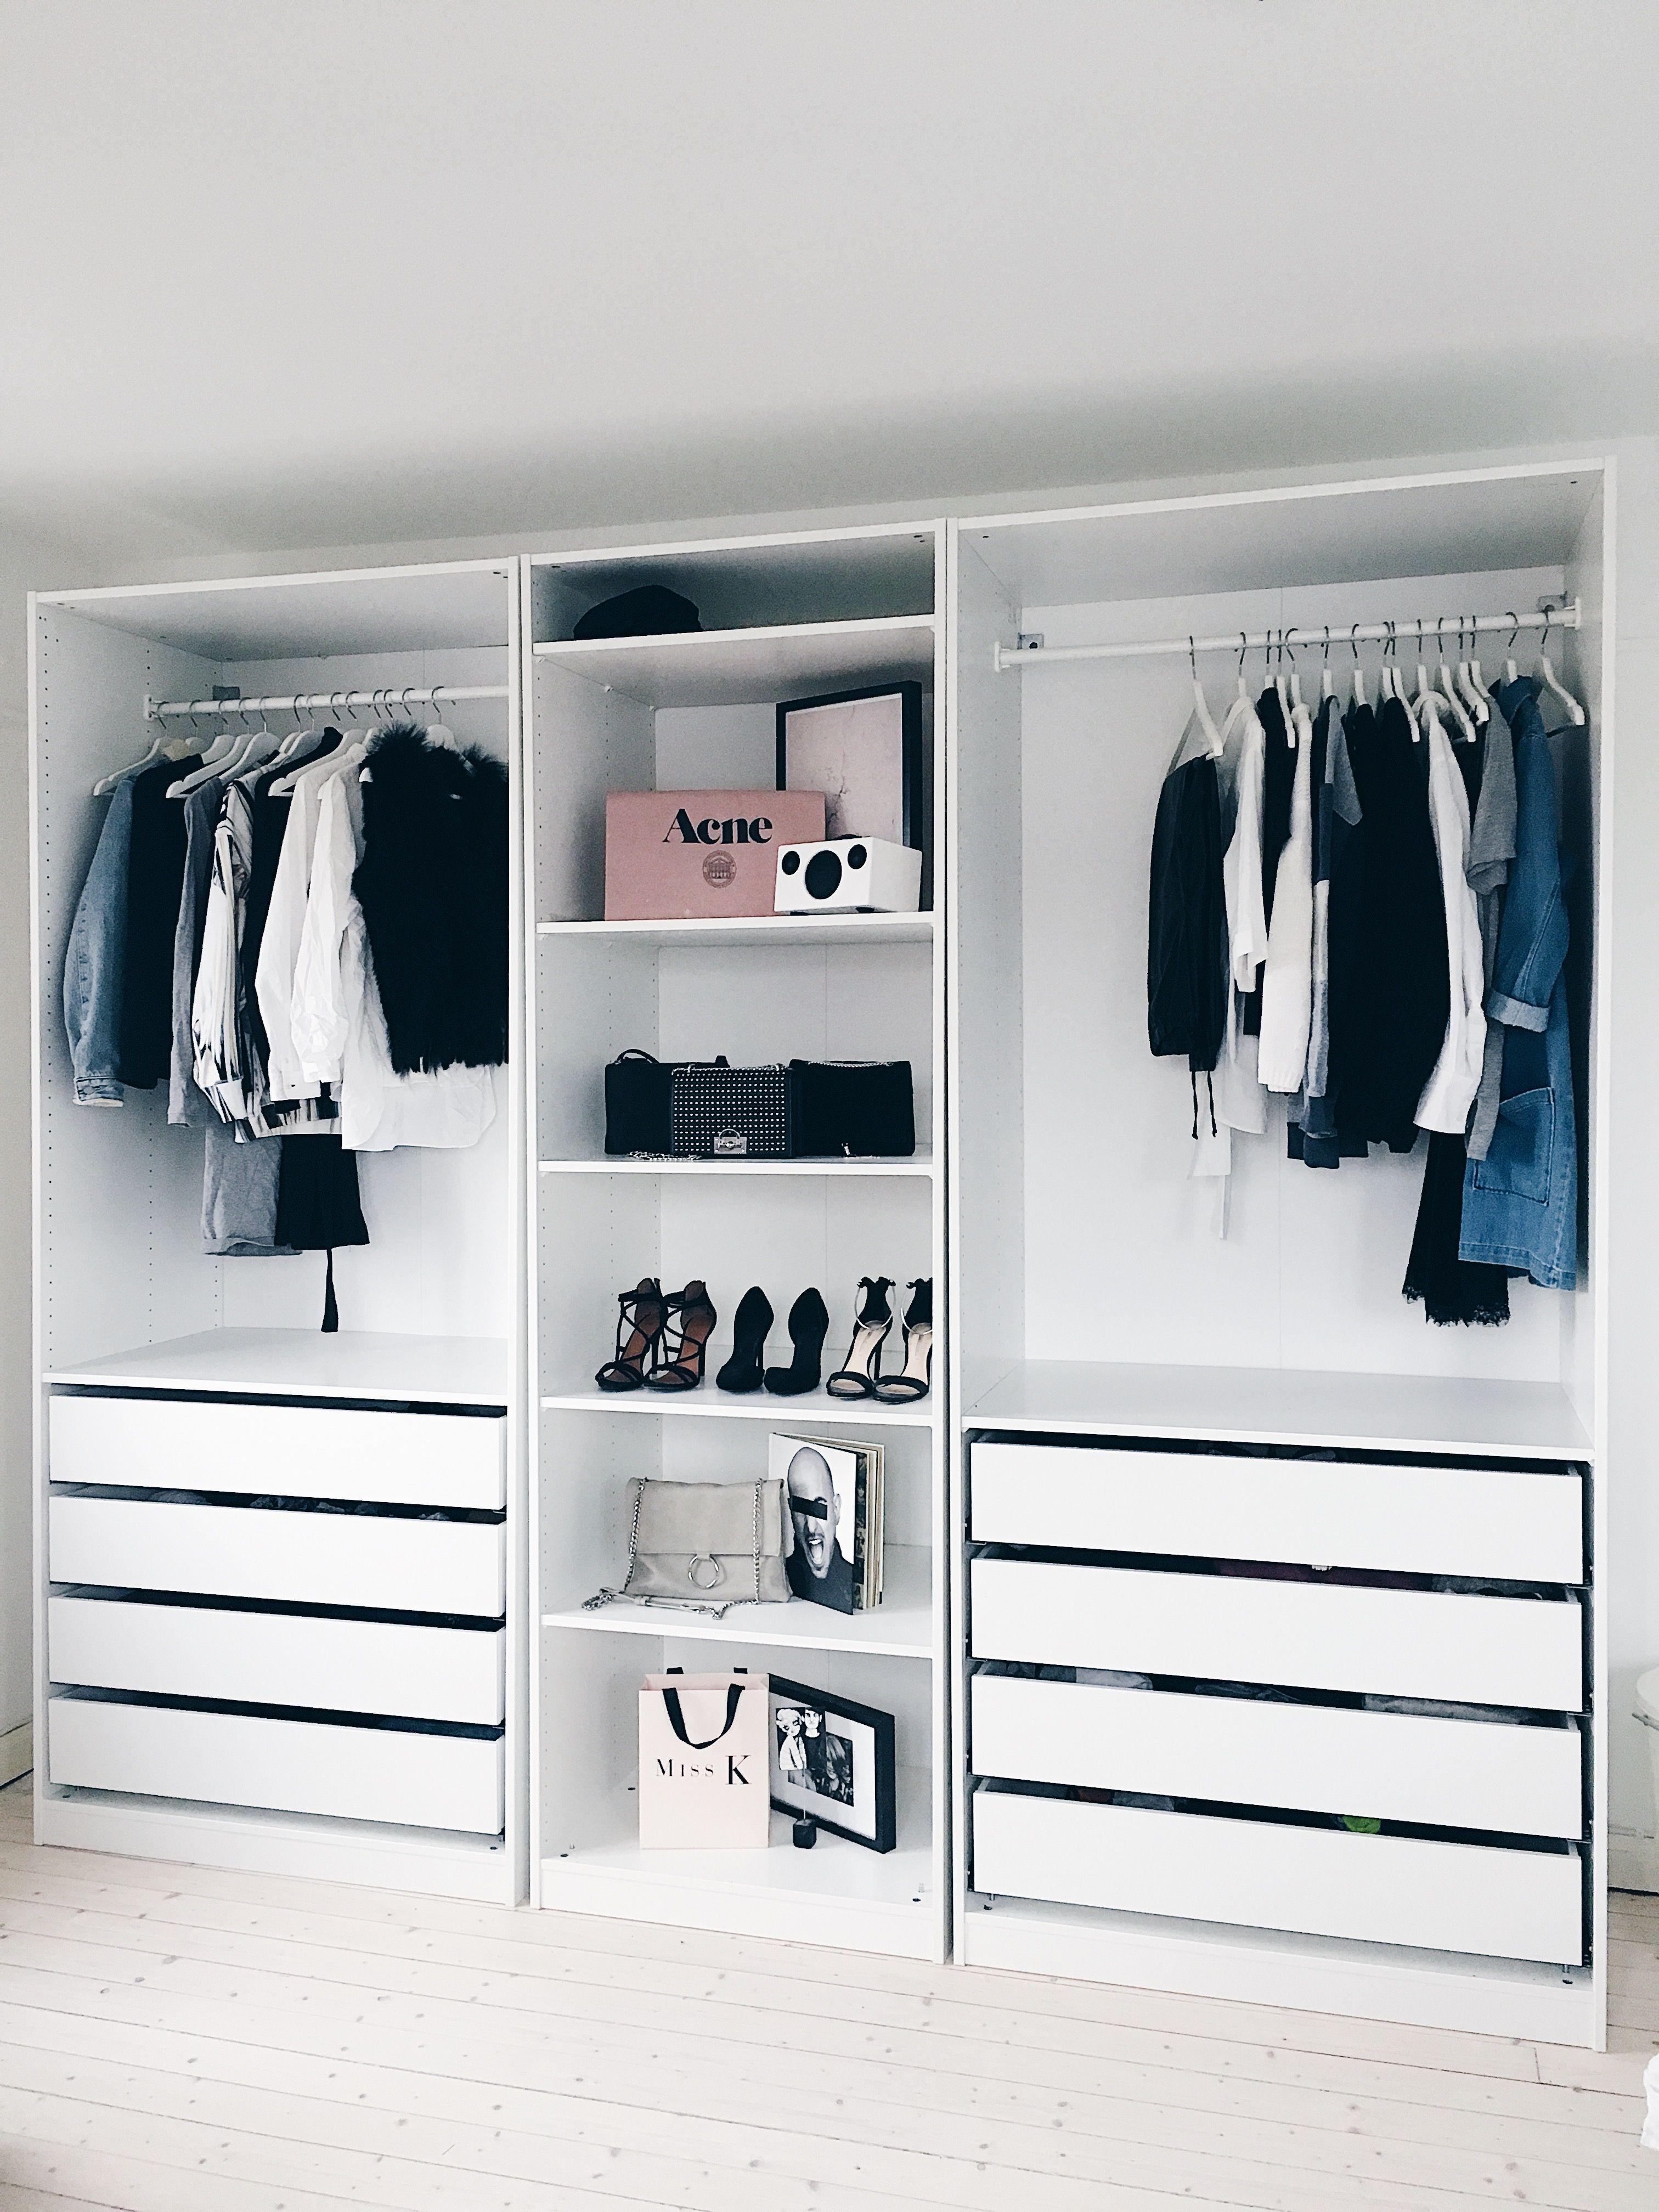 Katerinekosivchenko Diy Clothes Organization Decoracao Apartamento Pequeno Como Decorar Quarto Pequeno Decoracao Sala